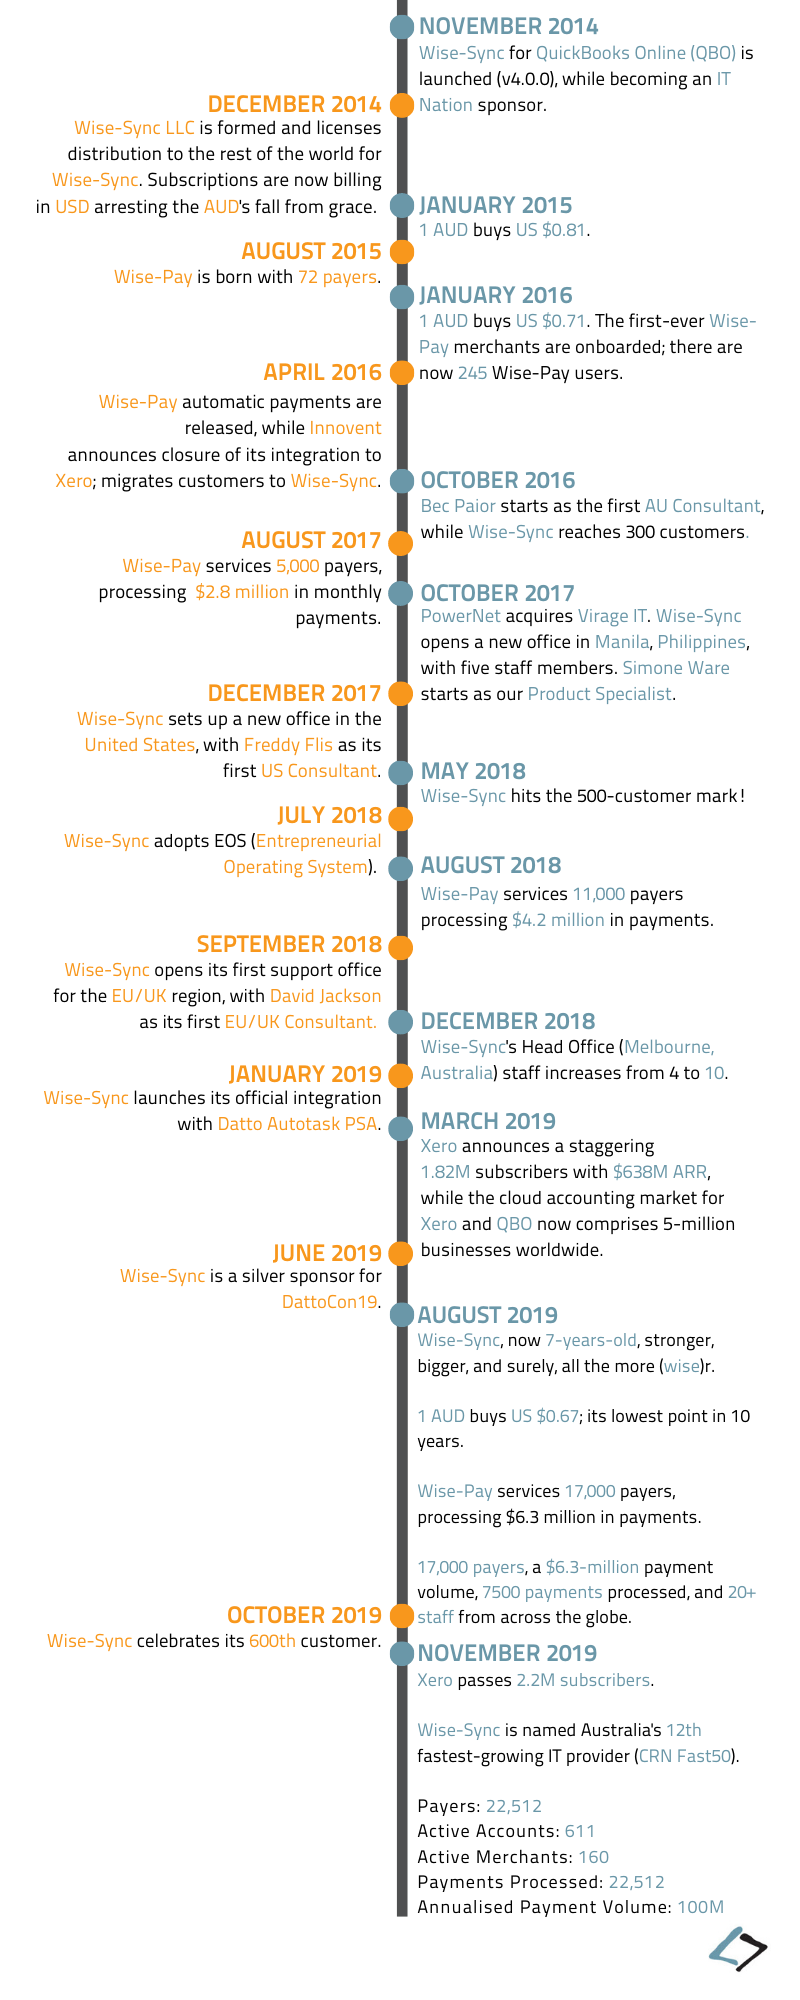 Wise-Syncs 10-Year Timeline - Revised x November 2019 - Pt.2.2